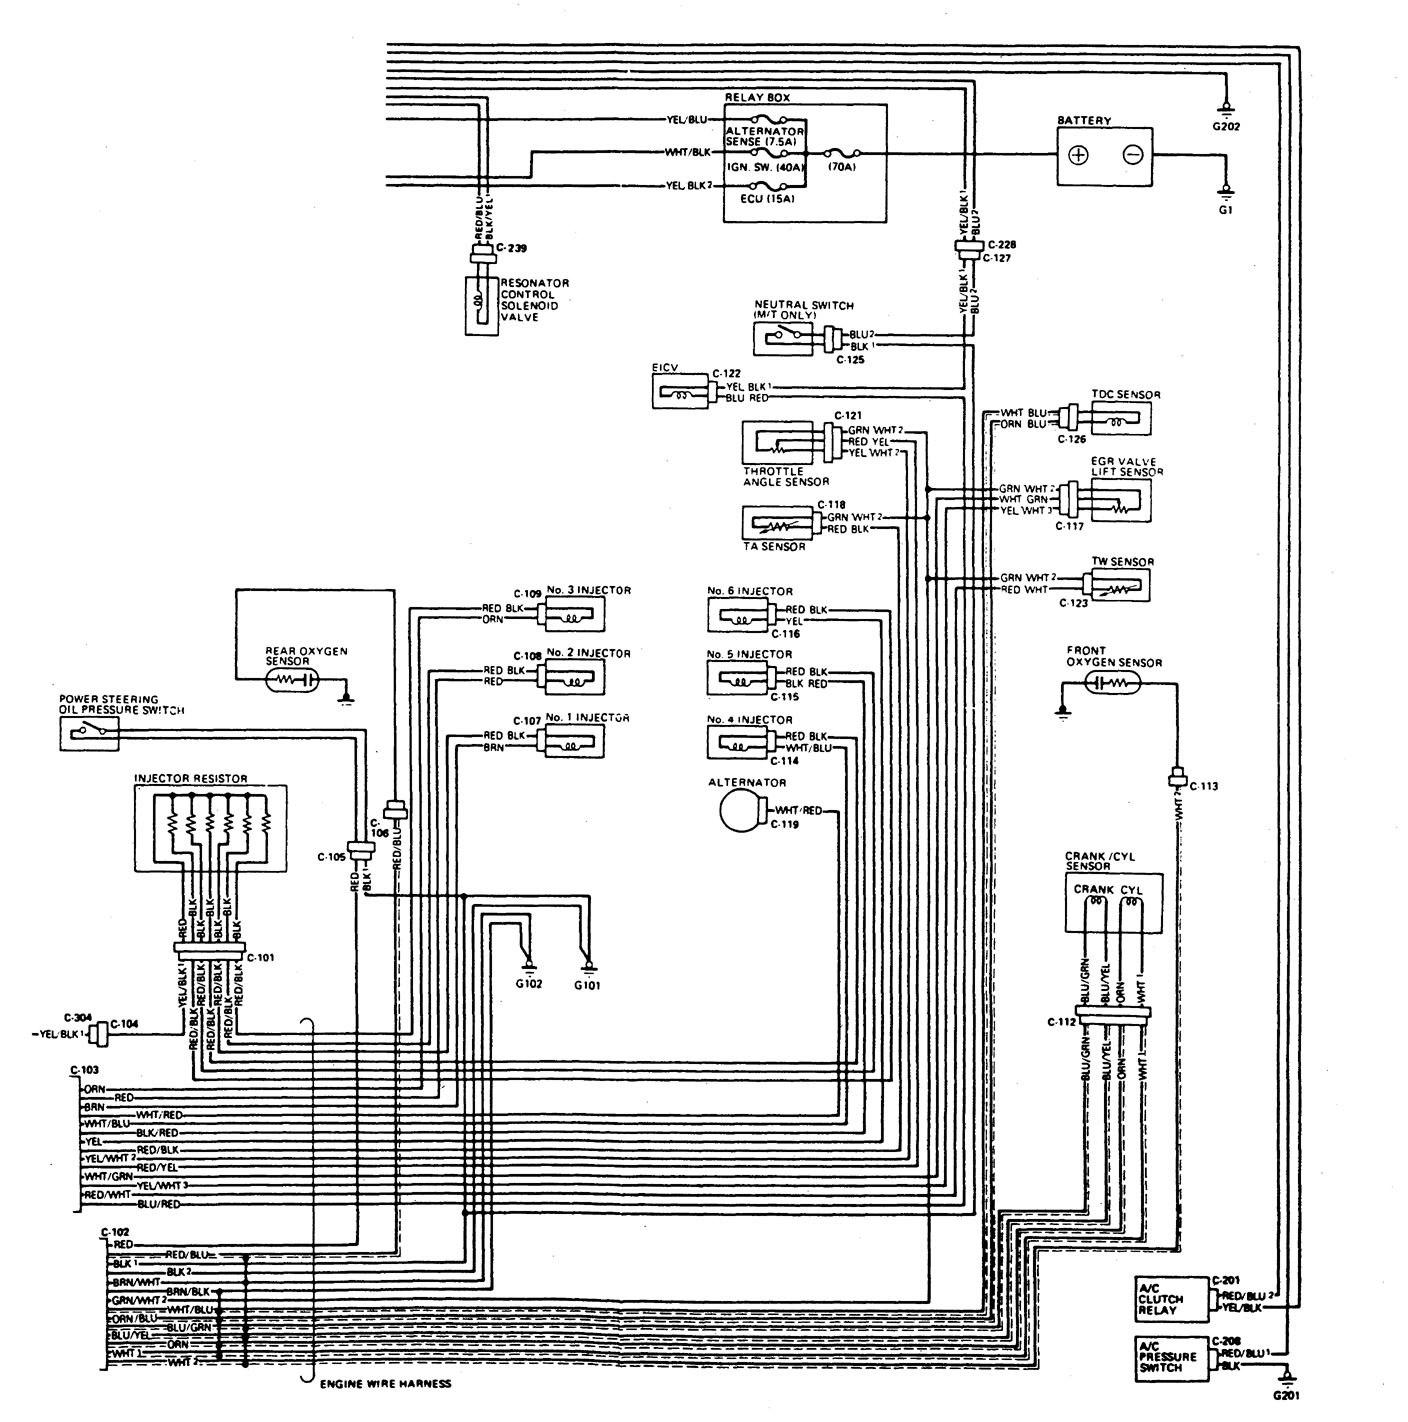 93 acura legend wiring diagram wiring diagram